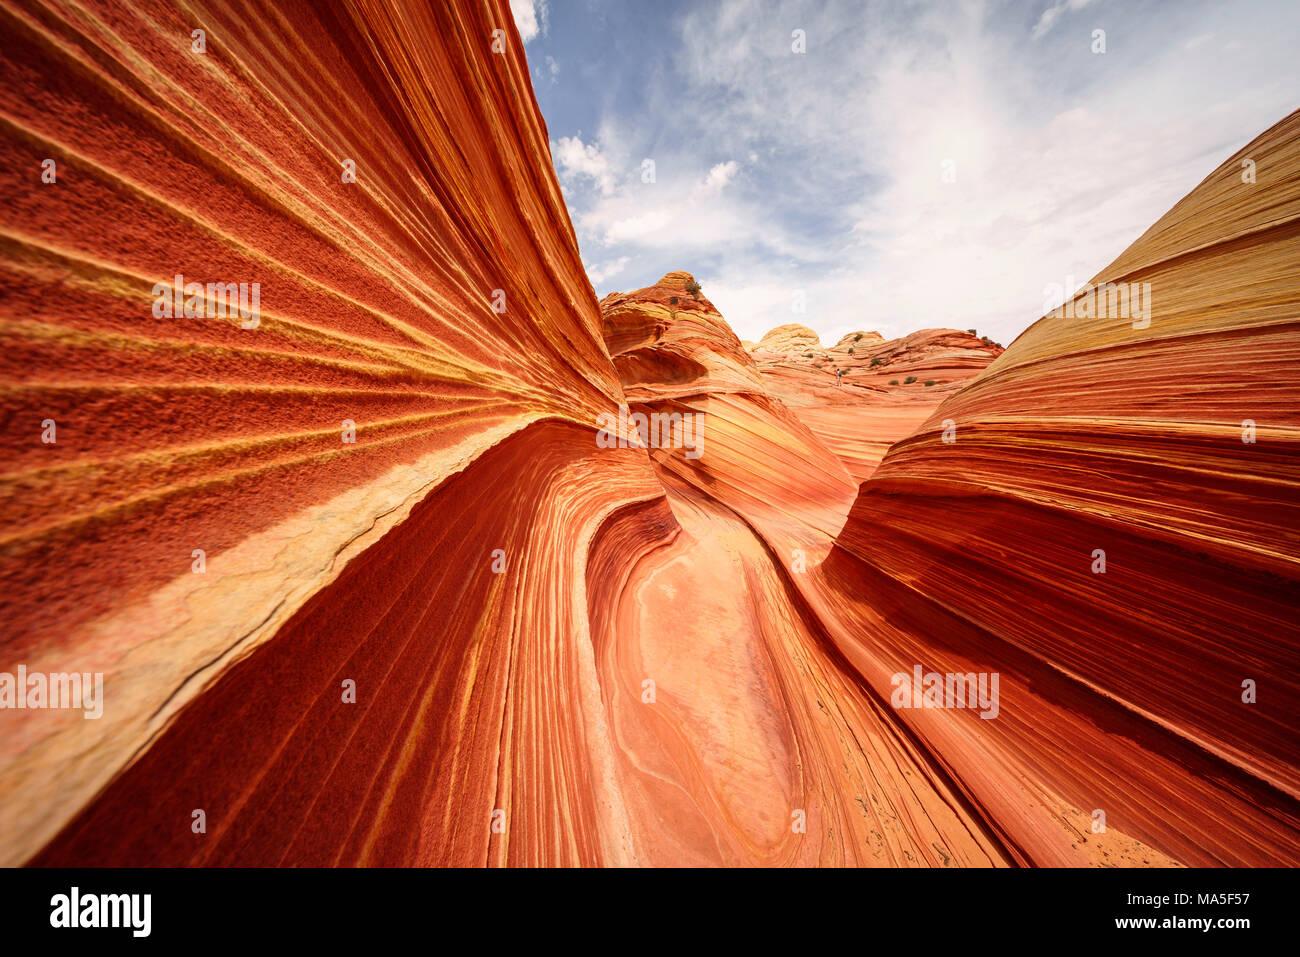 The Wave, Coyote Buttes North, Paria Canyon-Vermillion Cliffs Wilderness, Colorado Plateau, Arizona, USA Stock Photo